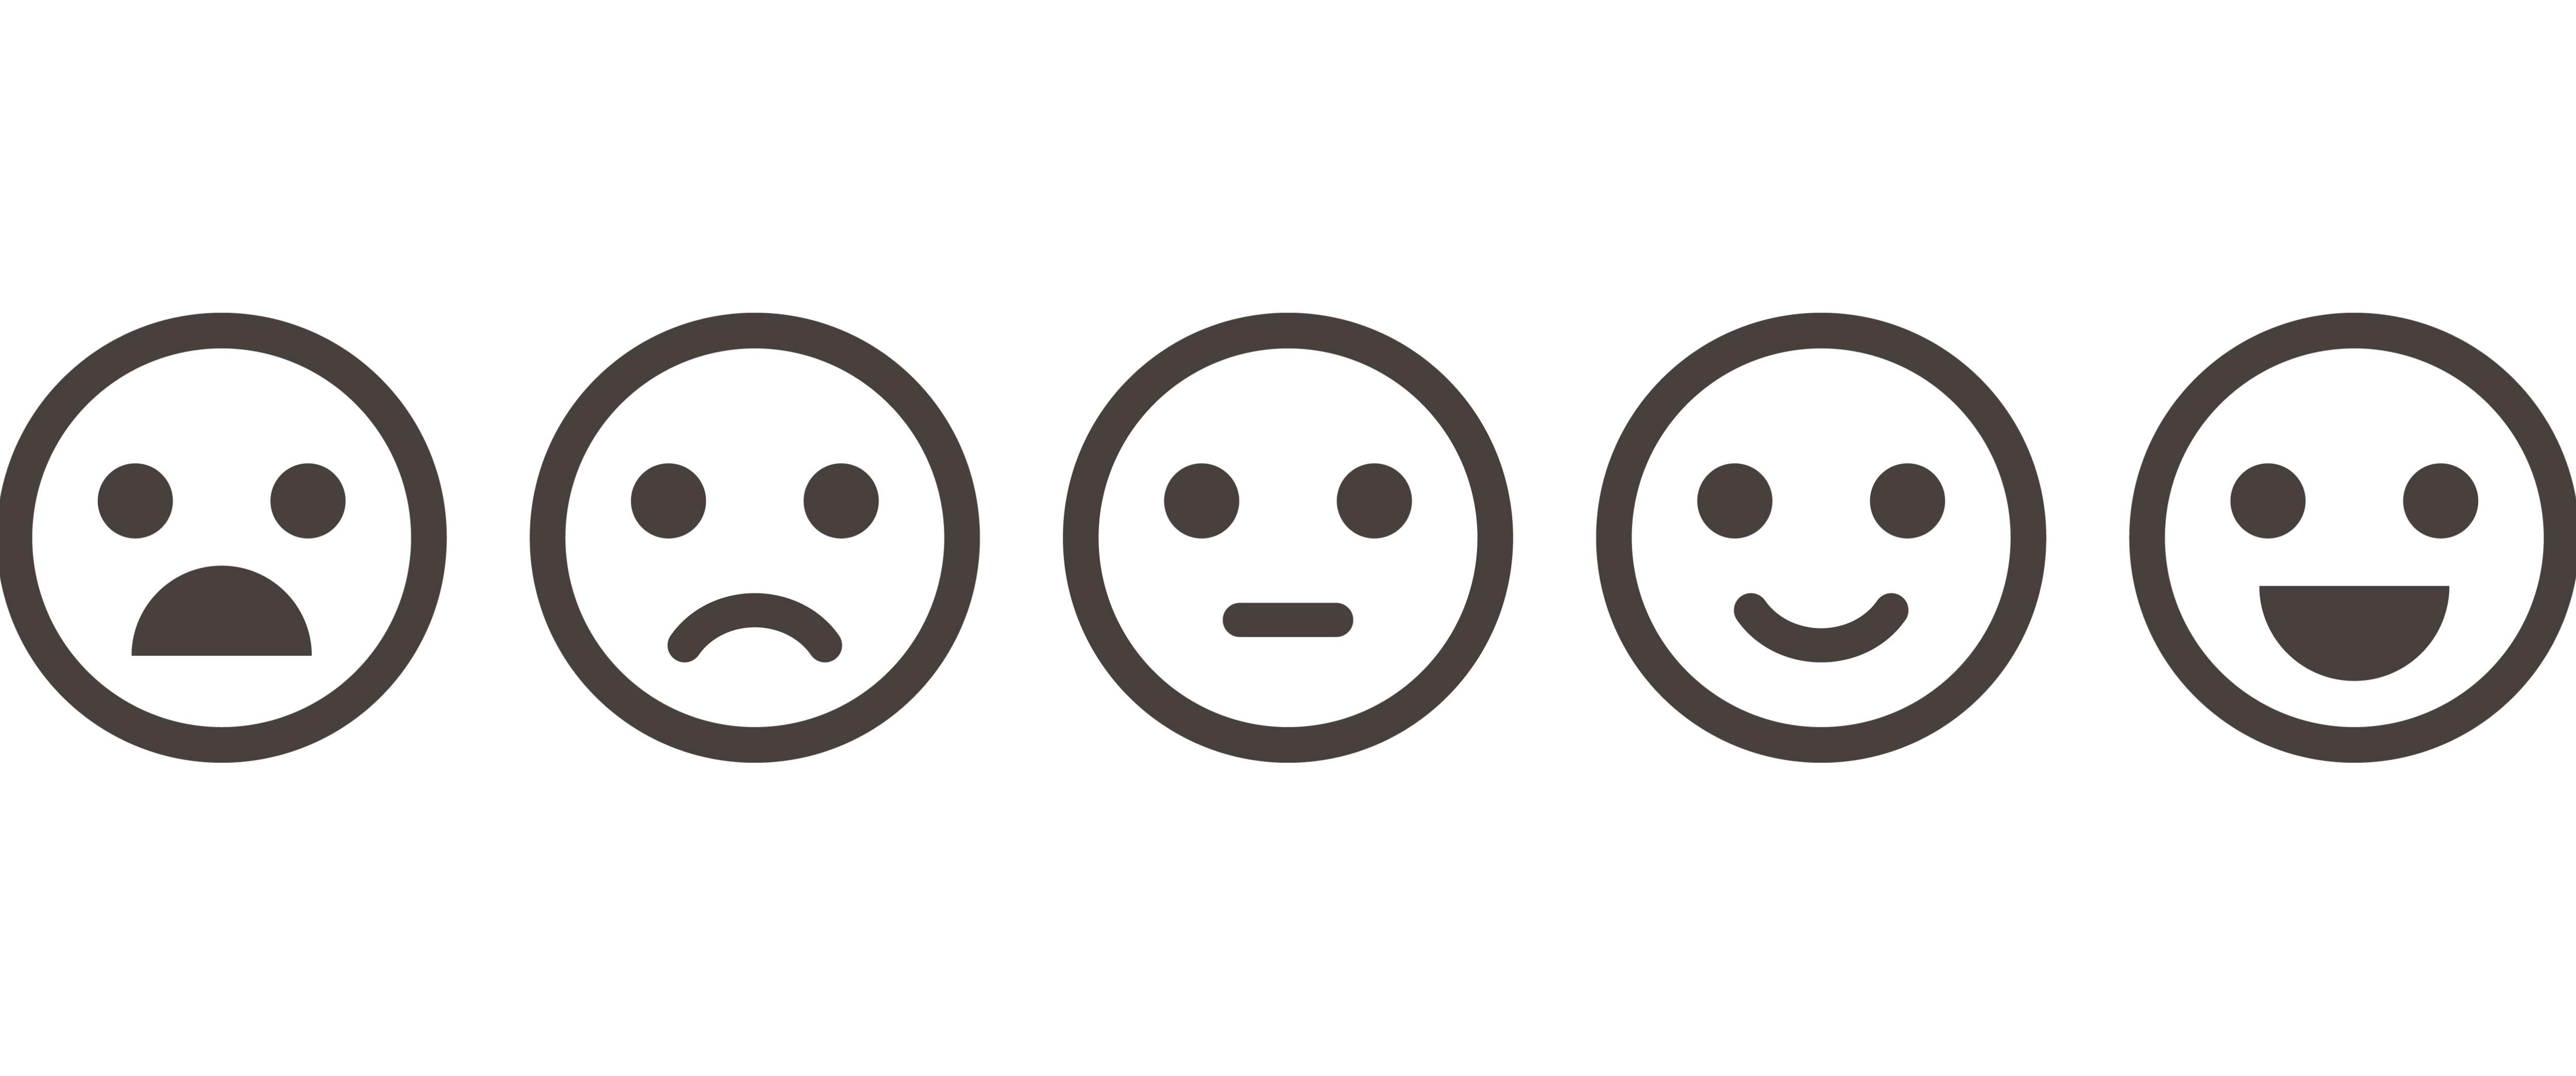 Blog Consumer Emotions 24Sept18